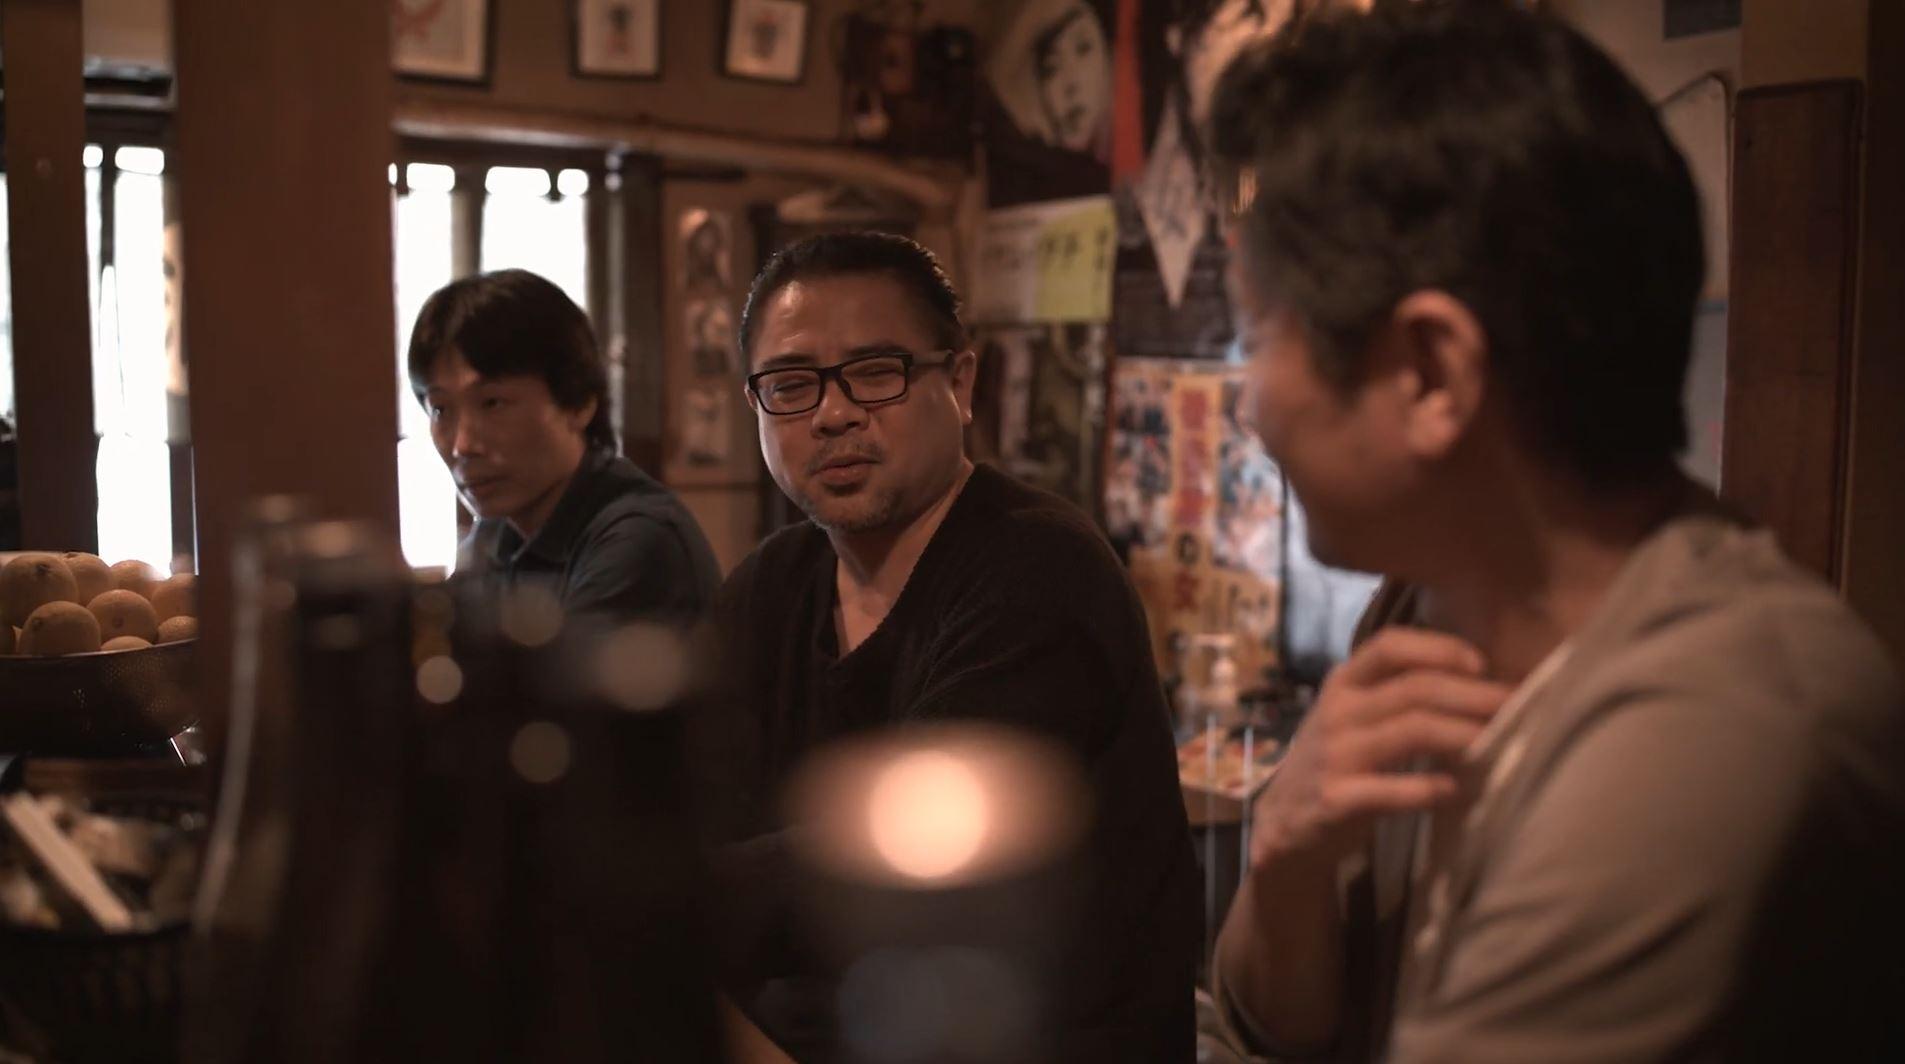 japan-studio-veterans-behind-silent-hill-gravity-rush-siren-and-the-last-guardian-leave-the-studio-to-form-bokeh-game-studio